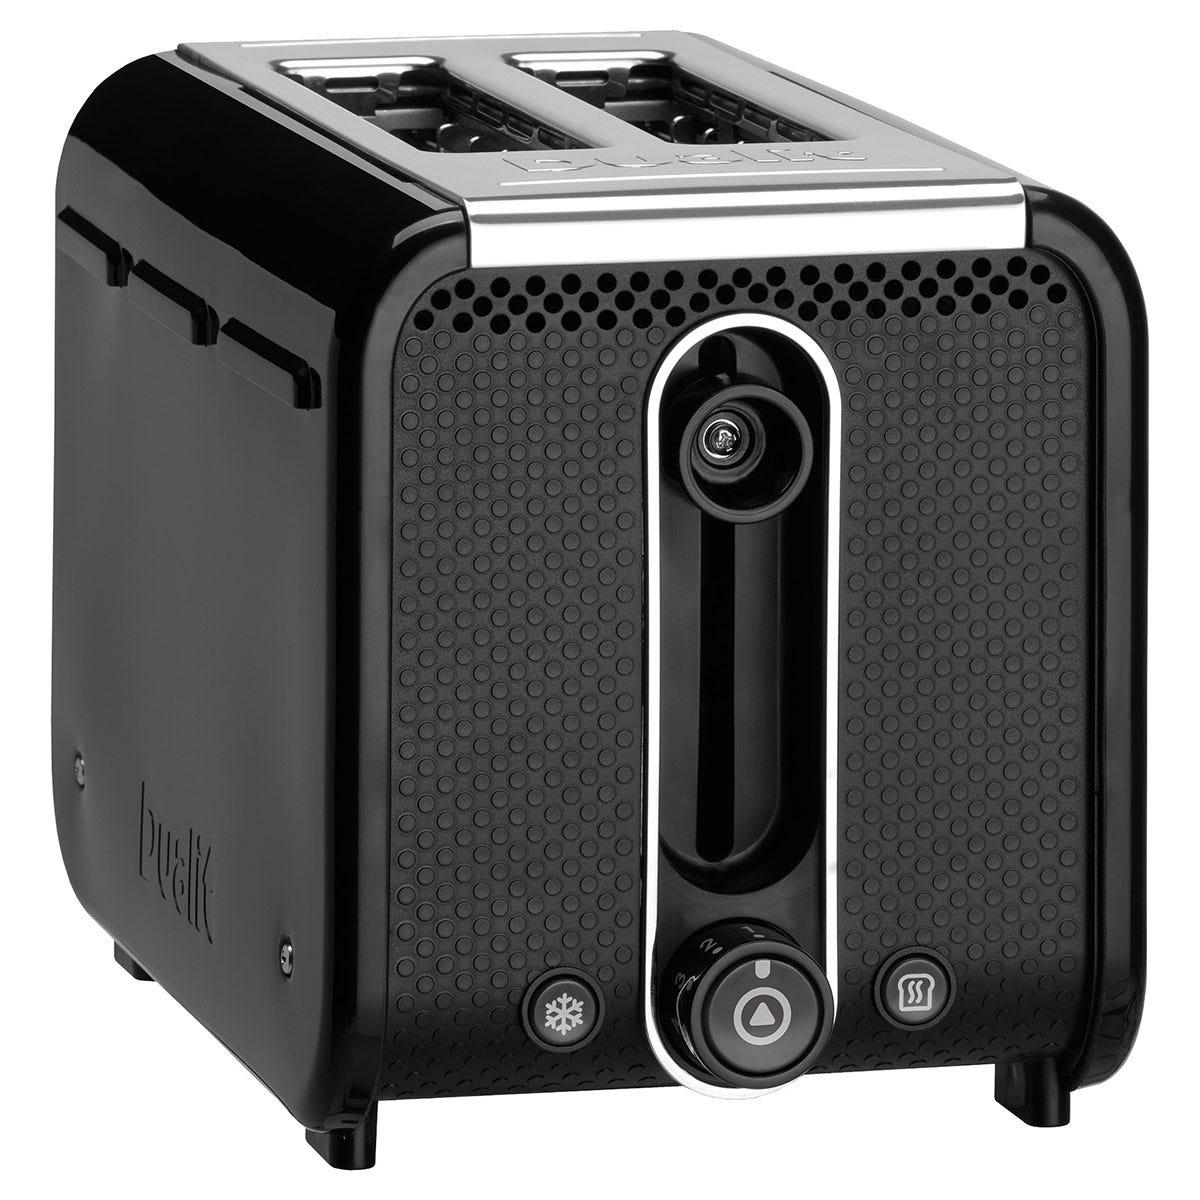 Igenix Dualit DA2641 2-Slice Studio Toaster with Removable Crumb Tray- Black